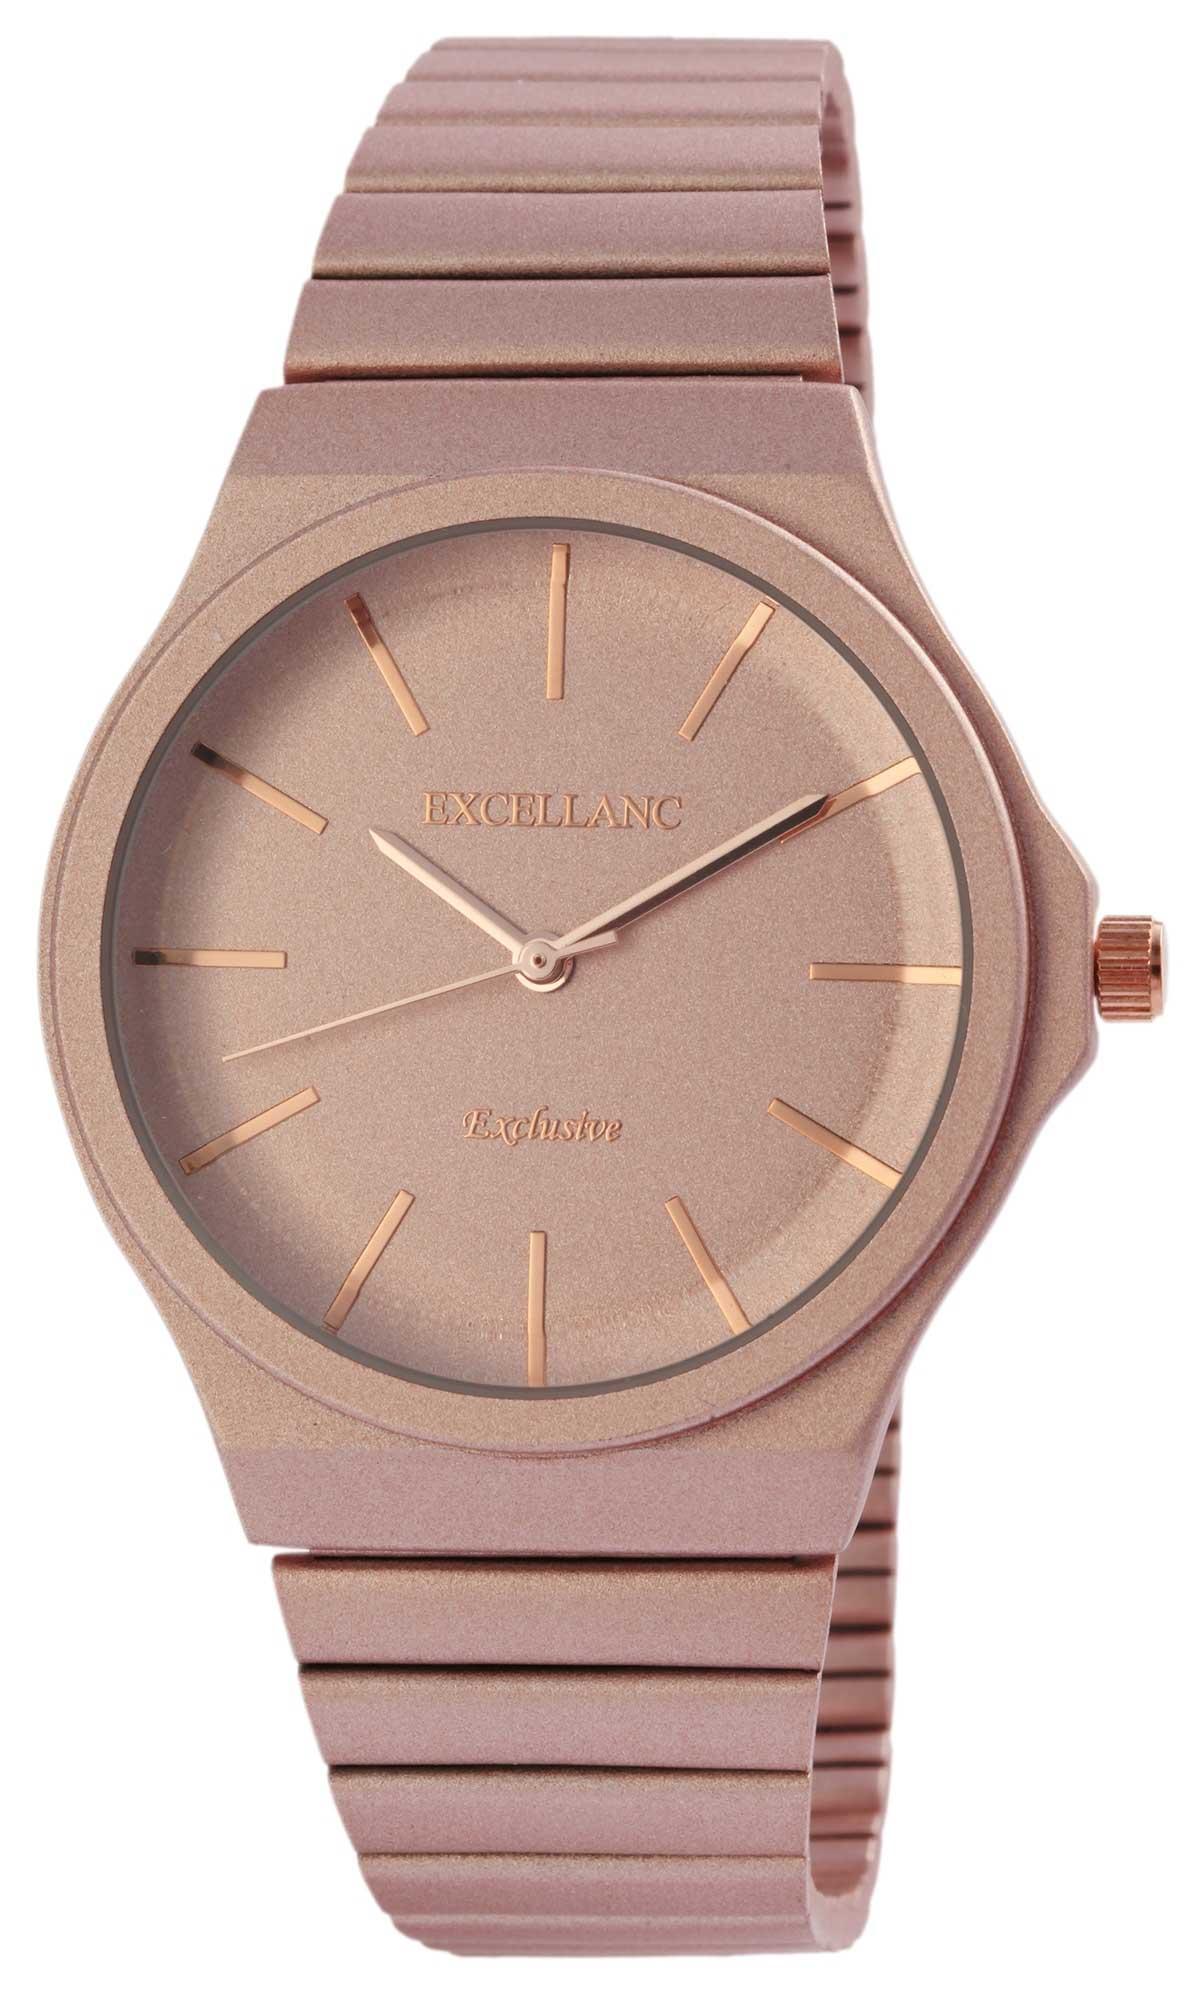 Damenuhr Armbanduhr Excellanc analog Uhr rose